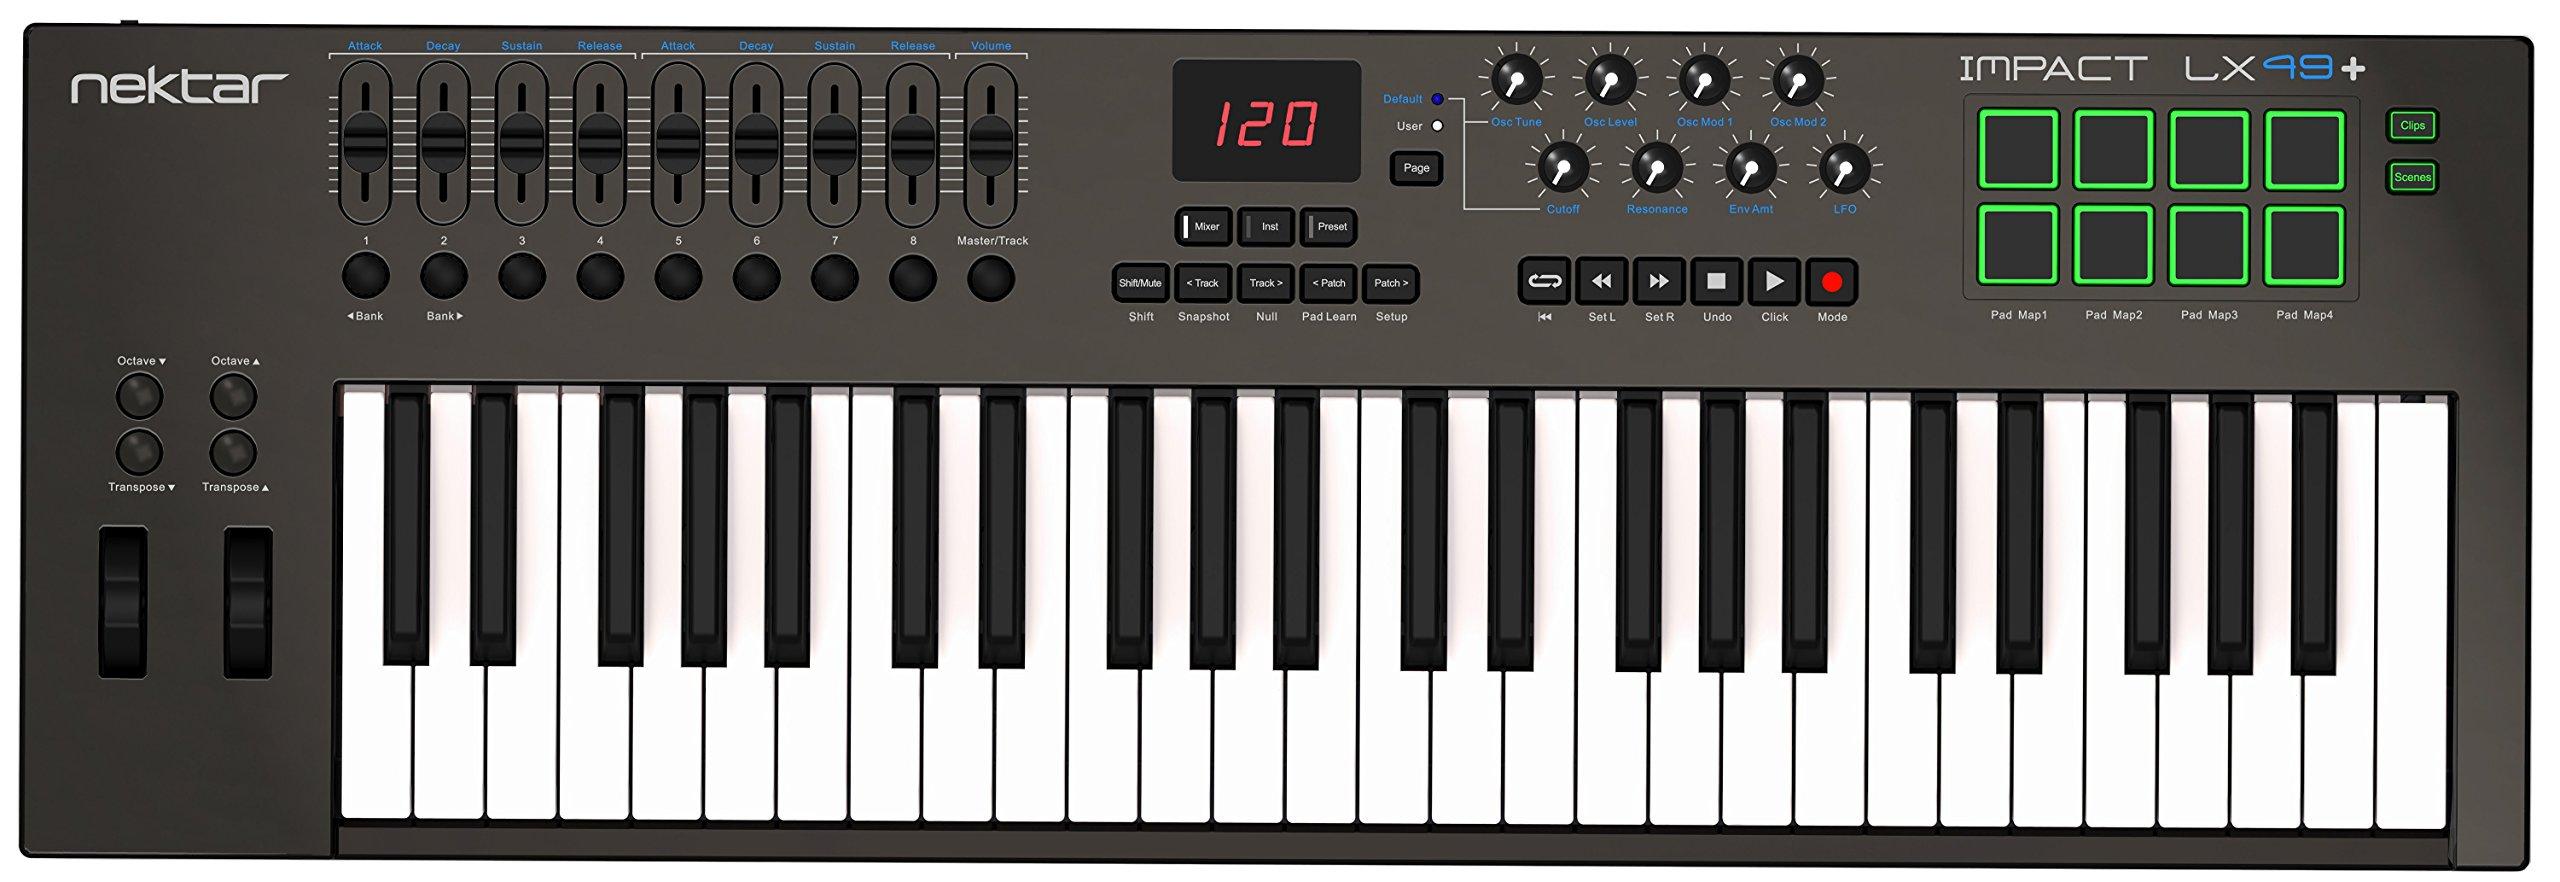 Nektar Impact LX49+ Keyboard Controller by Nektar